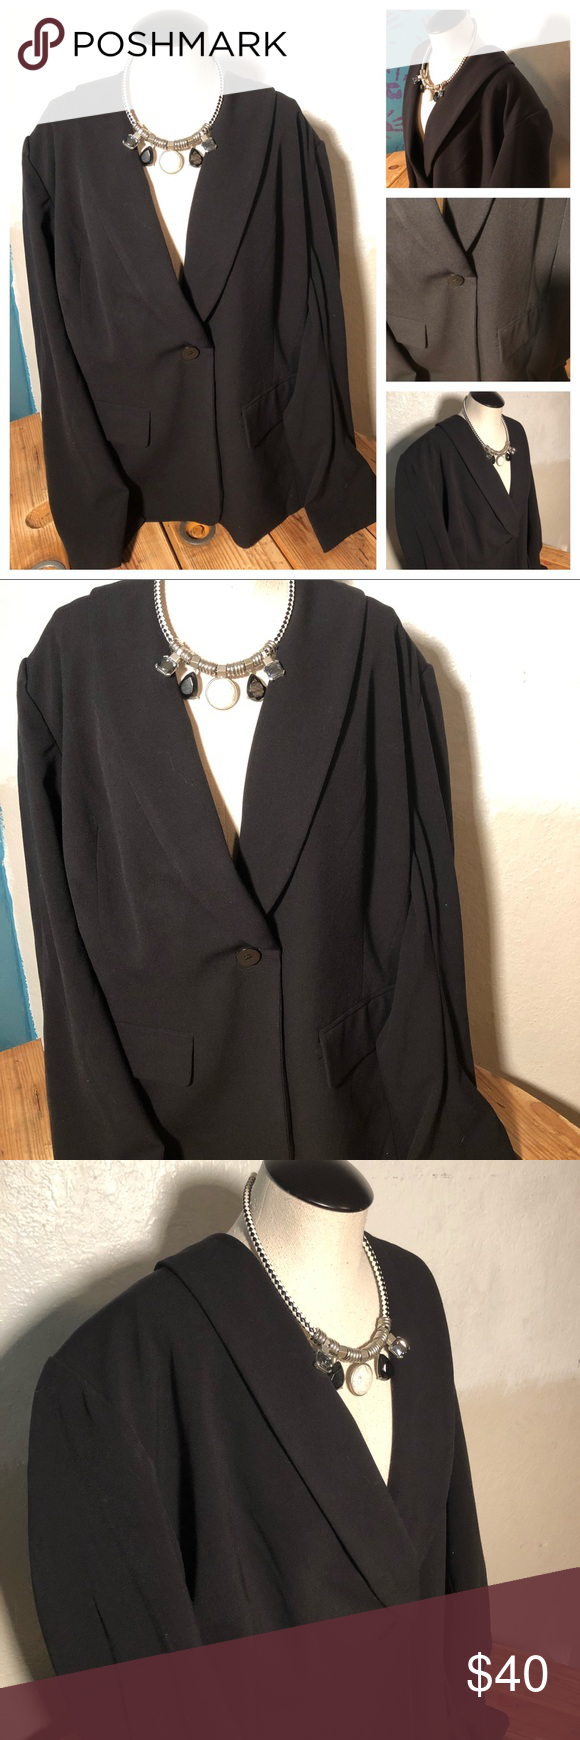 Lane Bryant Black Dress Jacket Lining And Buttons Black Dress Jacket Jacket Dress Lane Bryant Dresses [ 1740 x 580 Pixel ]